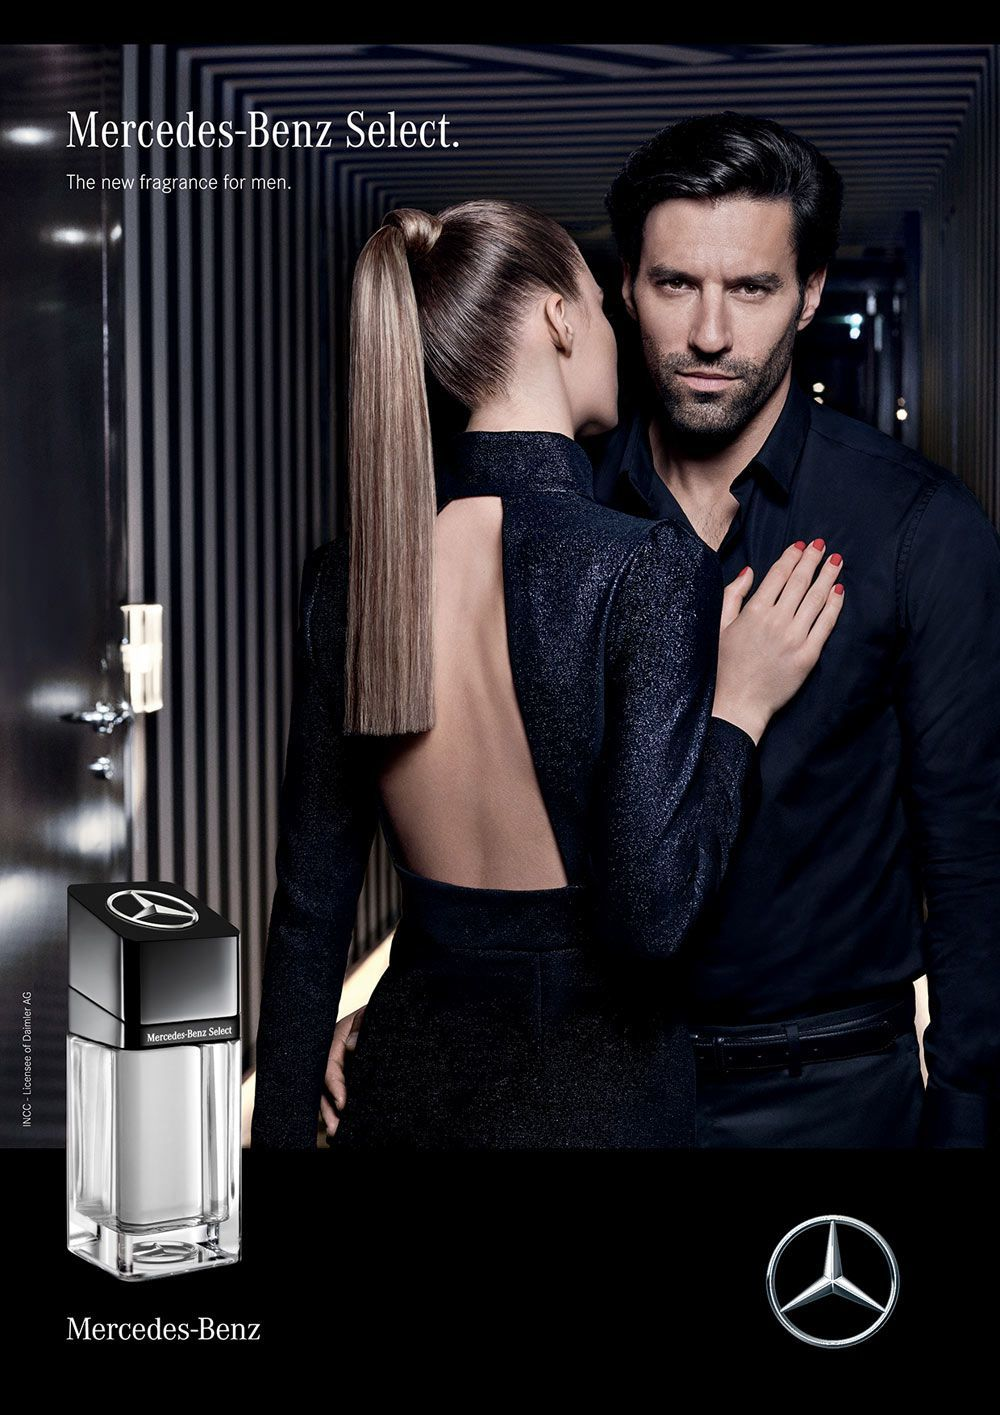 Perfume masc. Mercedes-Benz Select 40ml edt